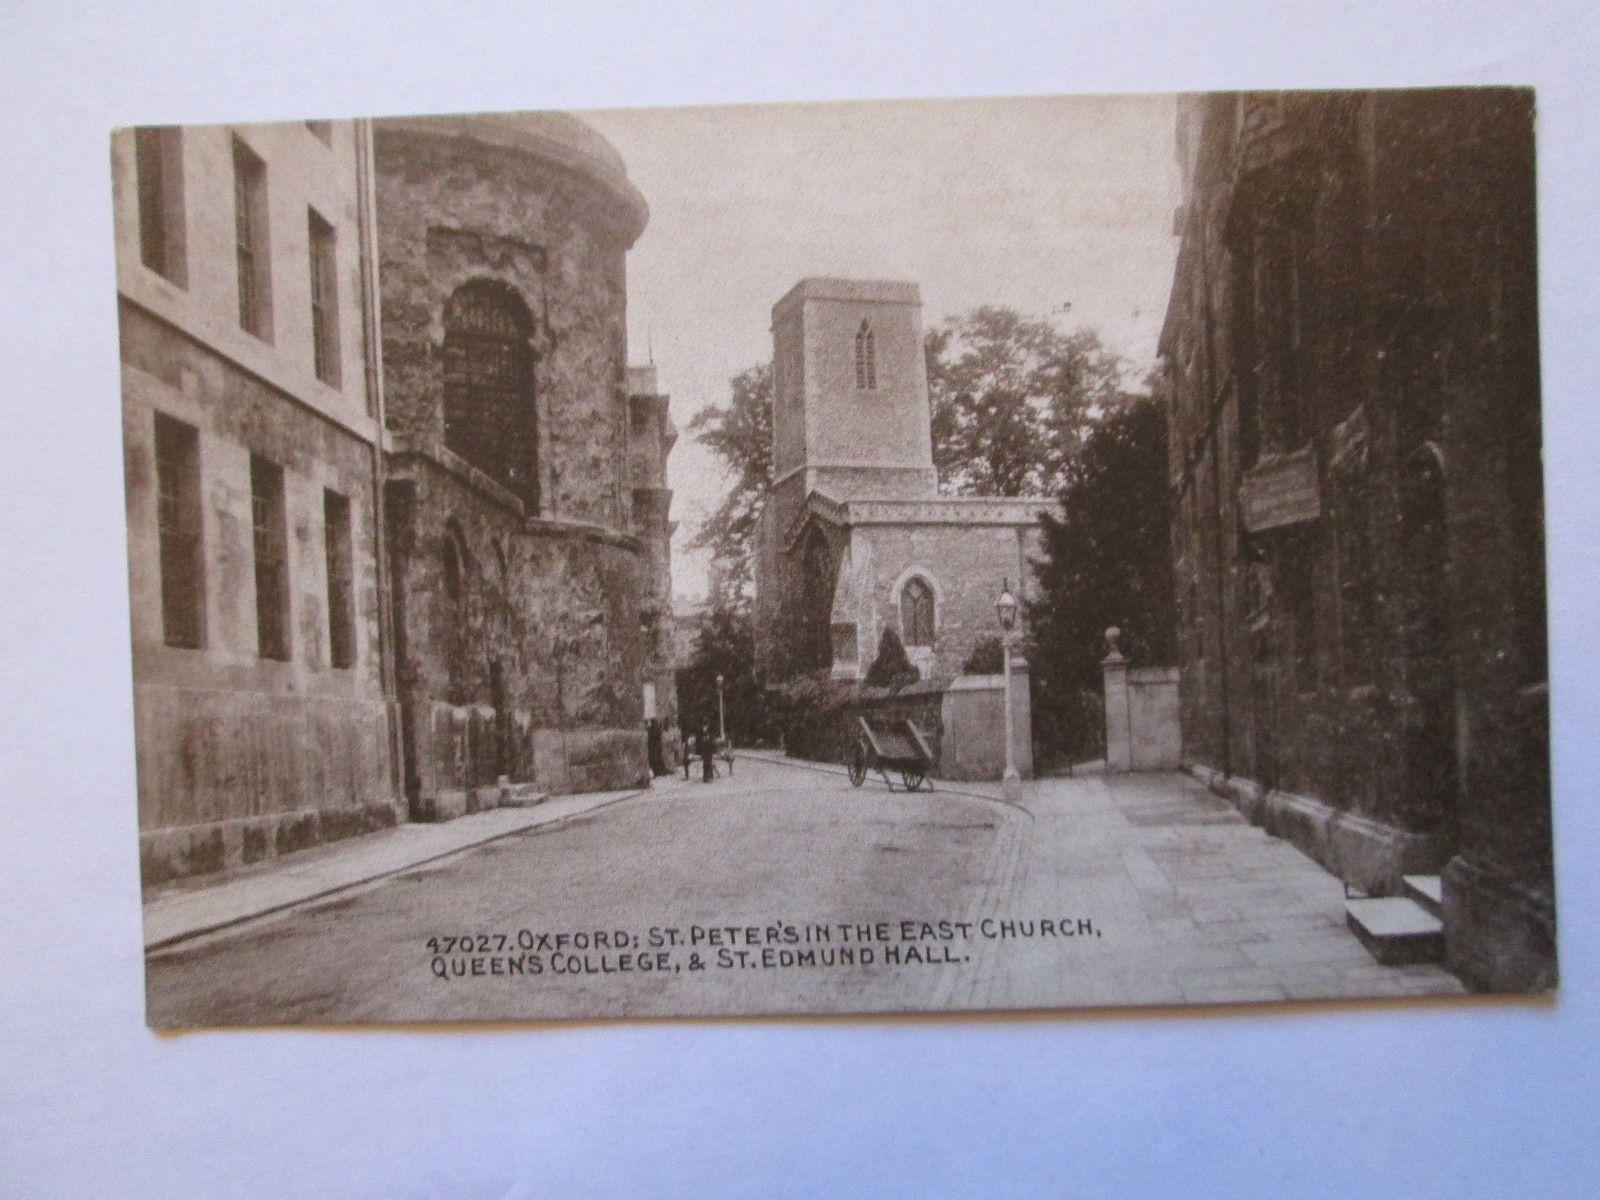 Postcard of Oxford St Peterus in the East Church Queenus College